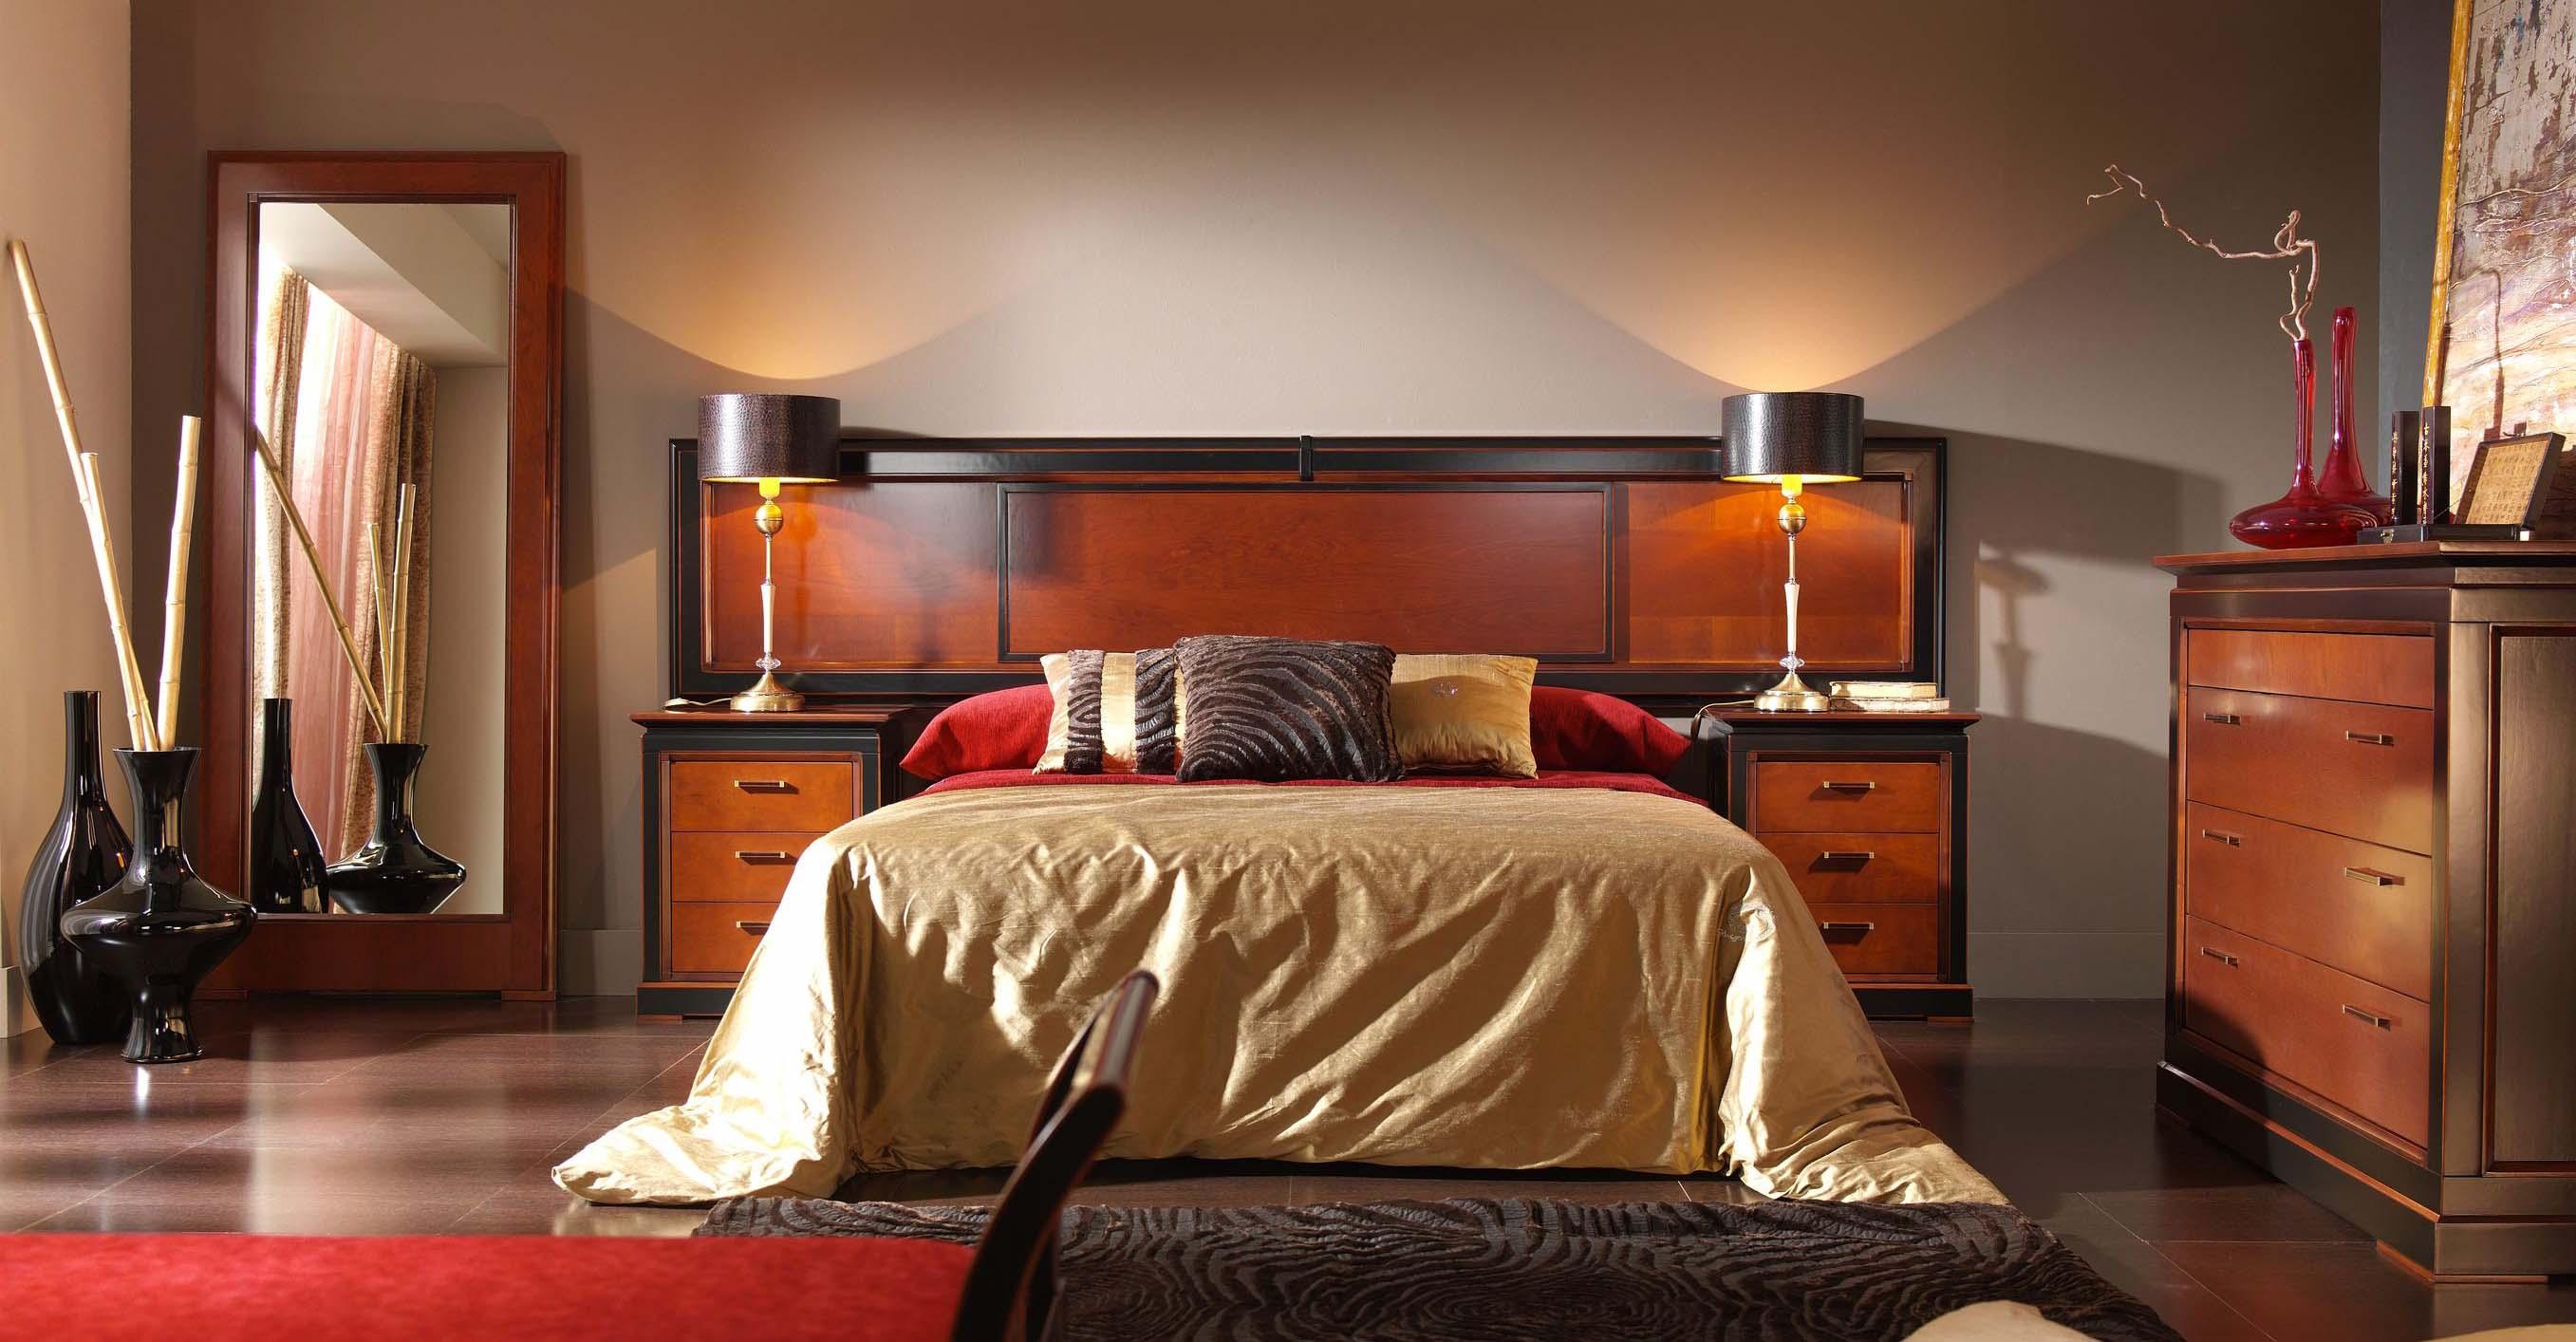 dormitorios de matrimonio de estilo clasico (58)